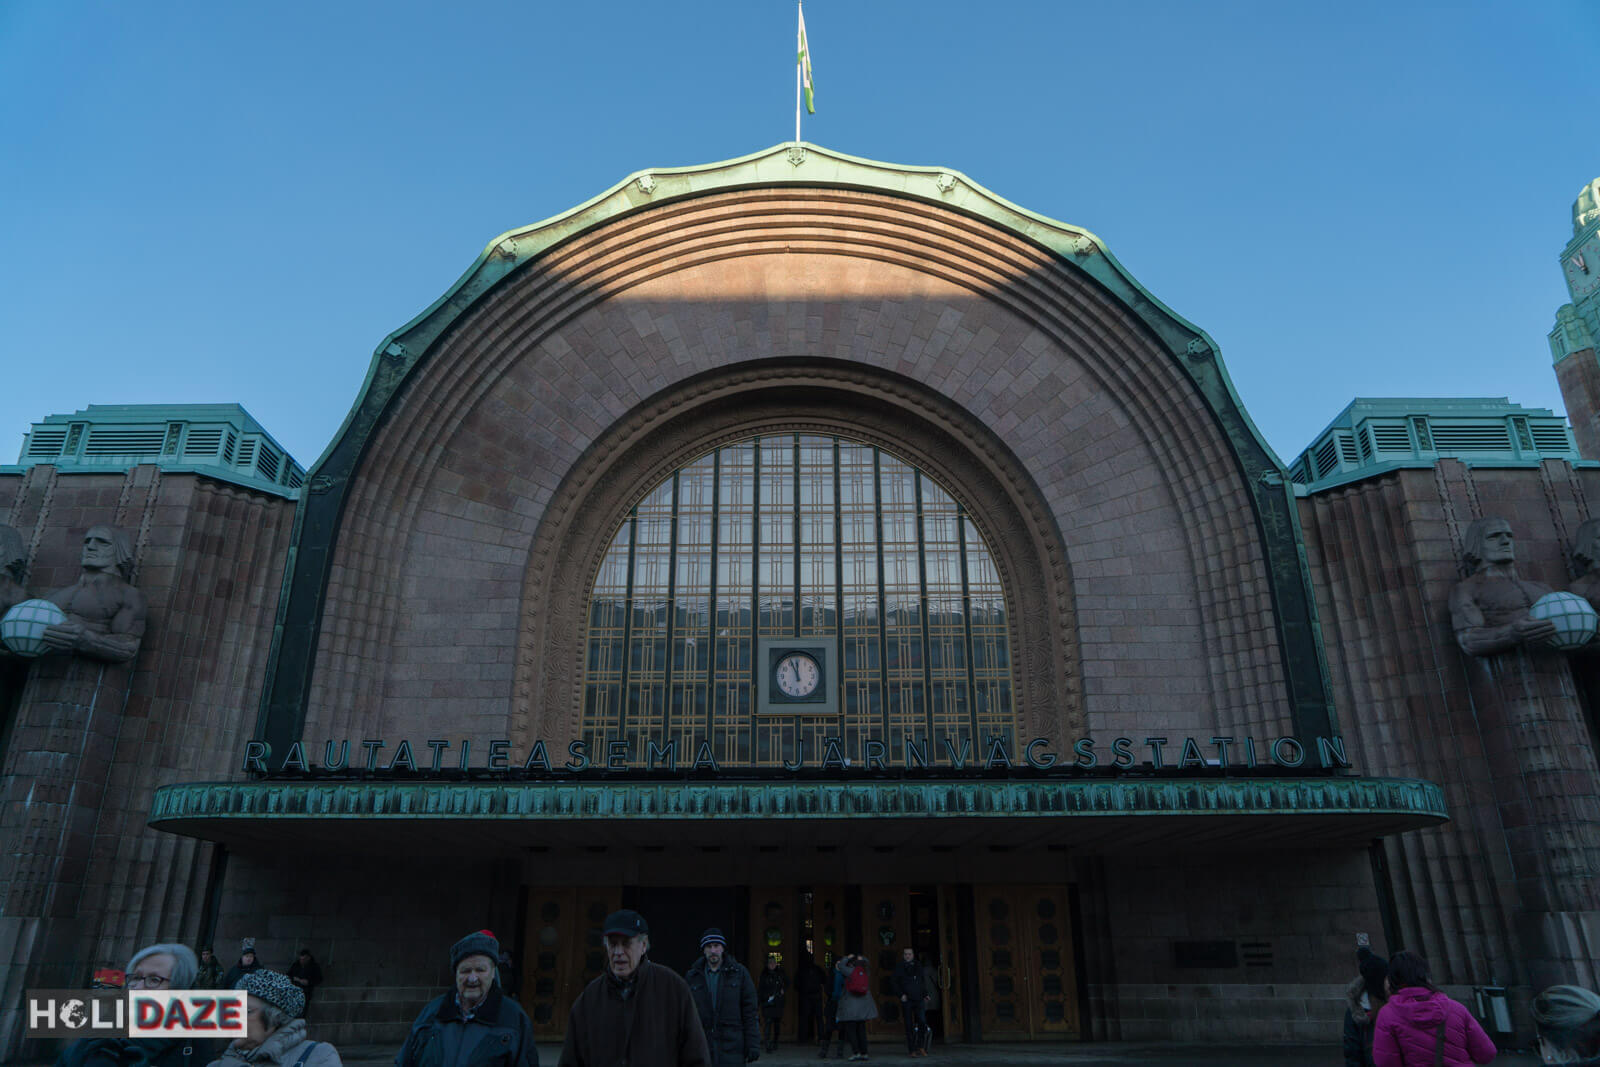 Helsinki Central Railway Station (Helsingin Päärautatieasema) is located right in the center of downtown near the Helsinki Art Museum